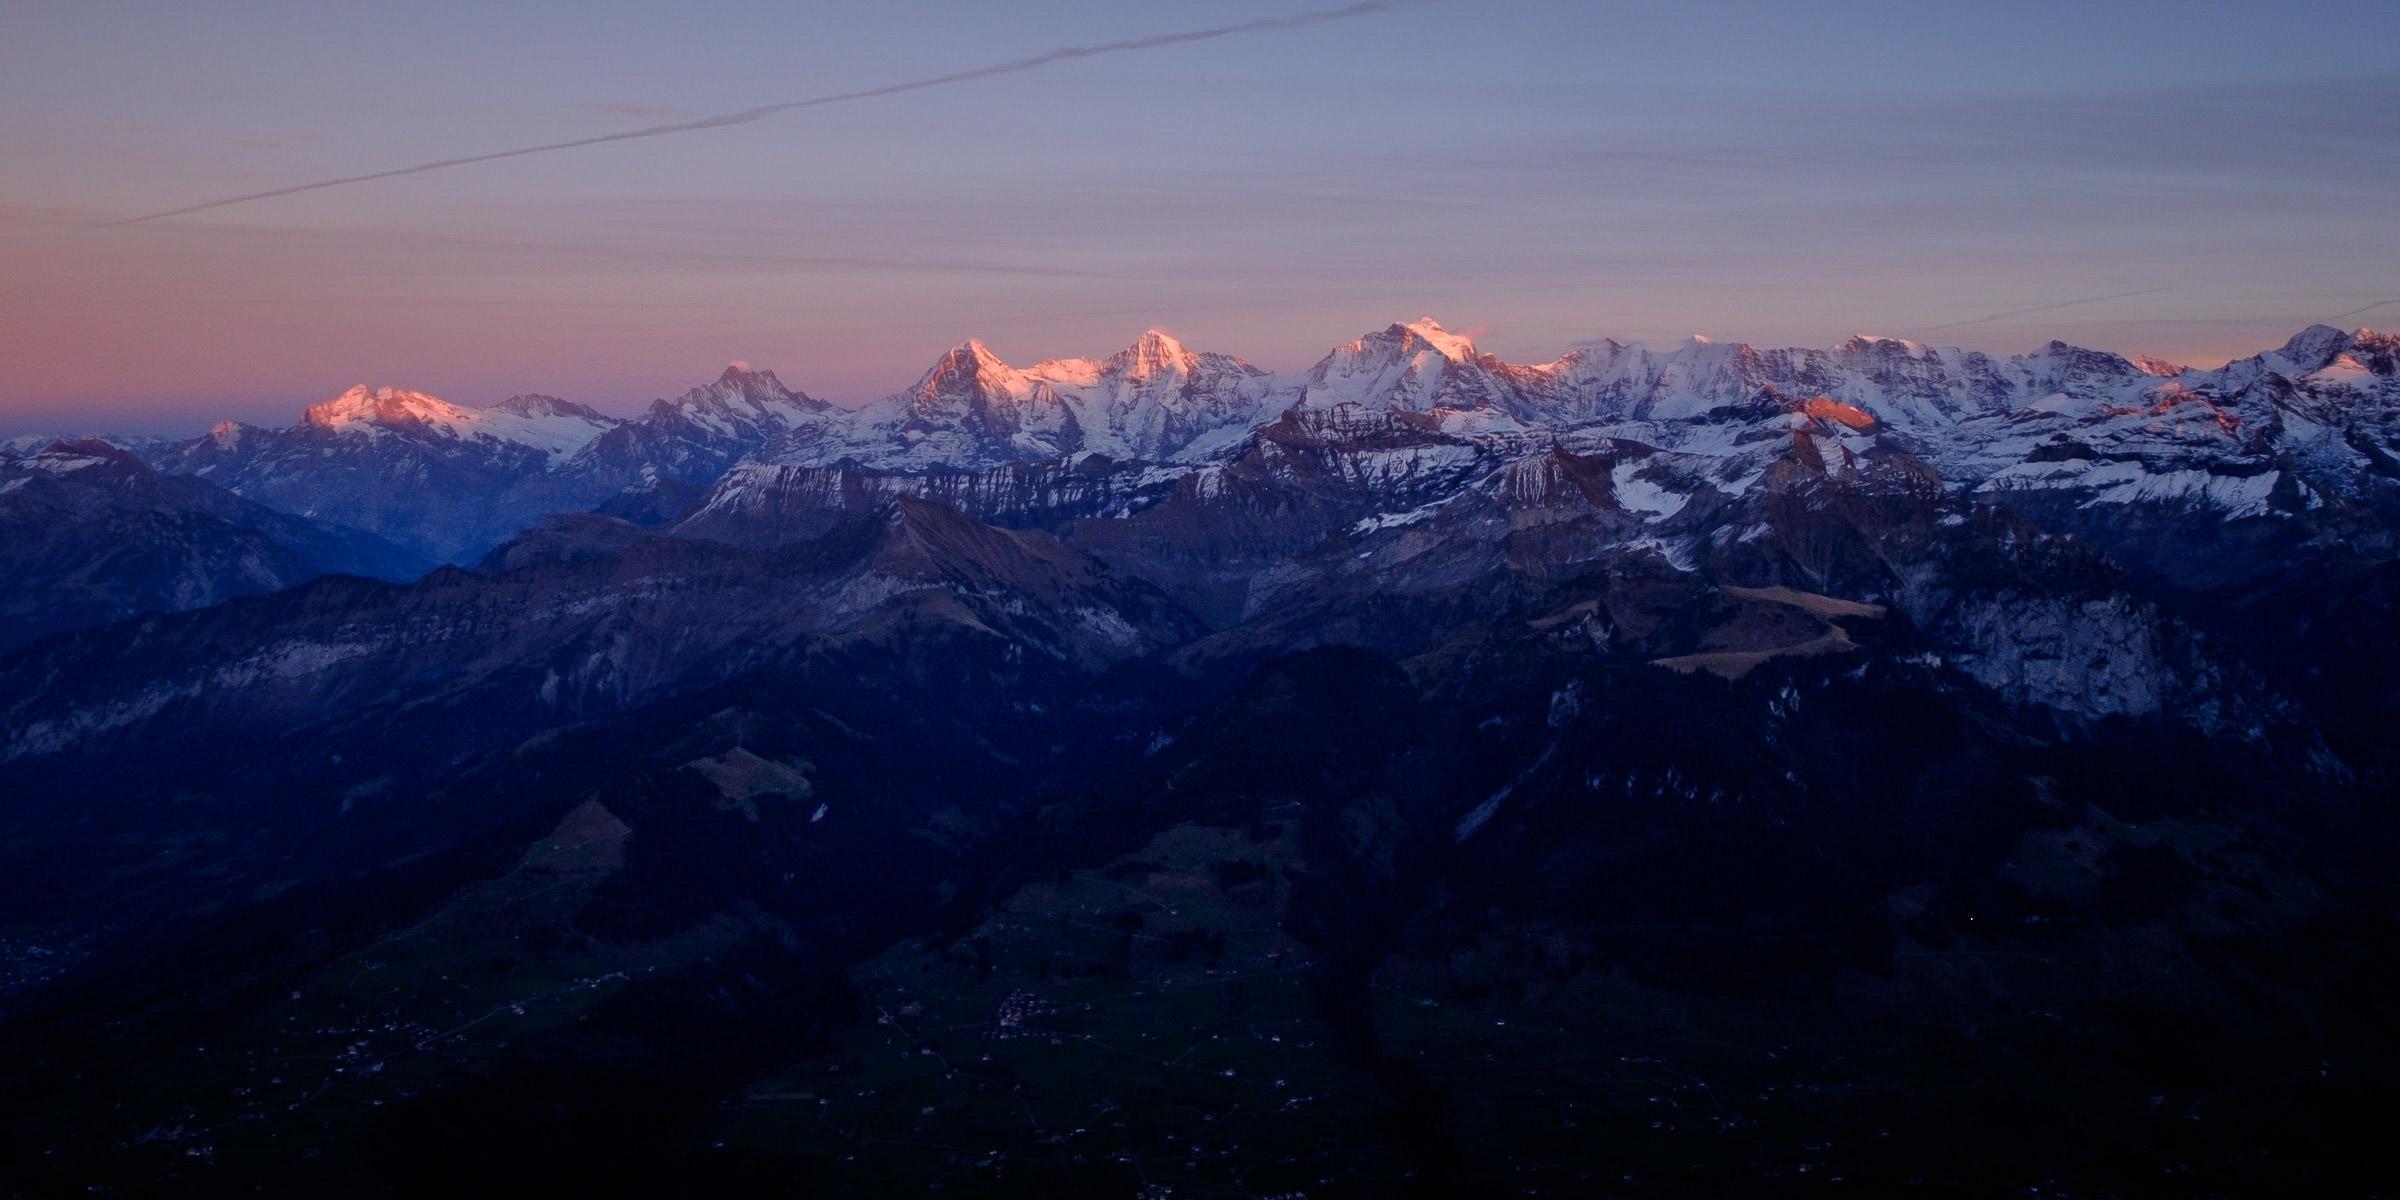 Eiger, Mönch and Jungfrau from Niesen Kulm, Switzerland